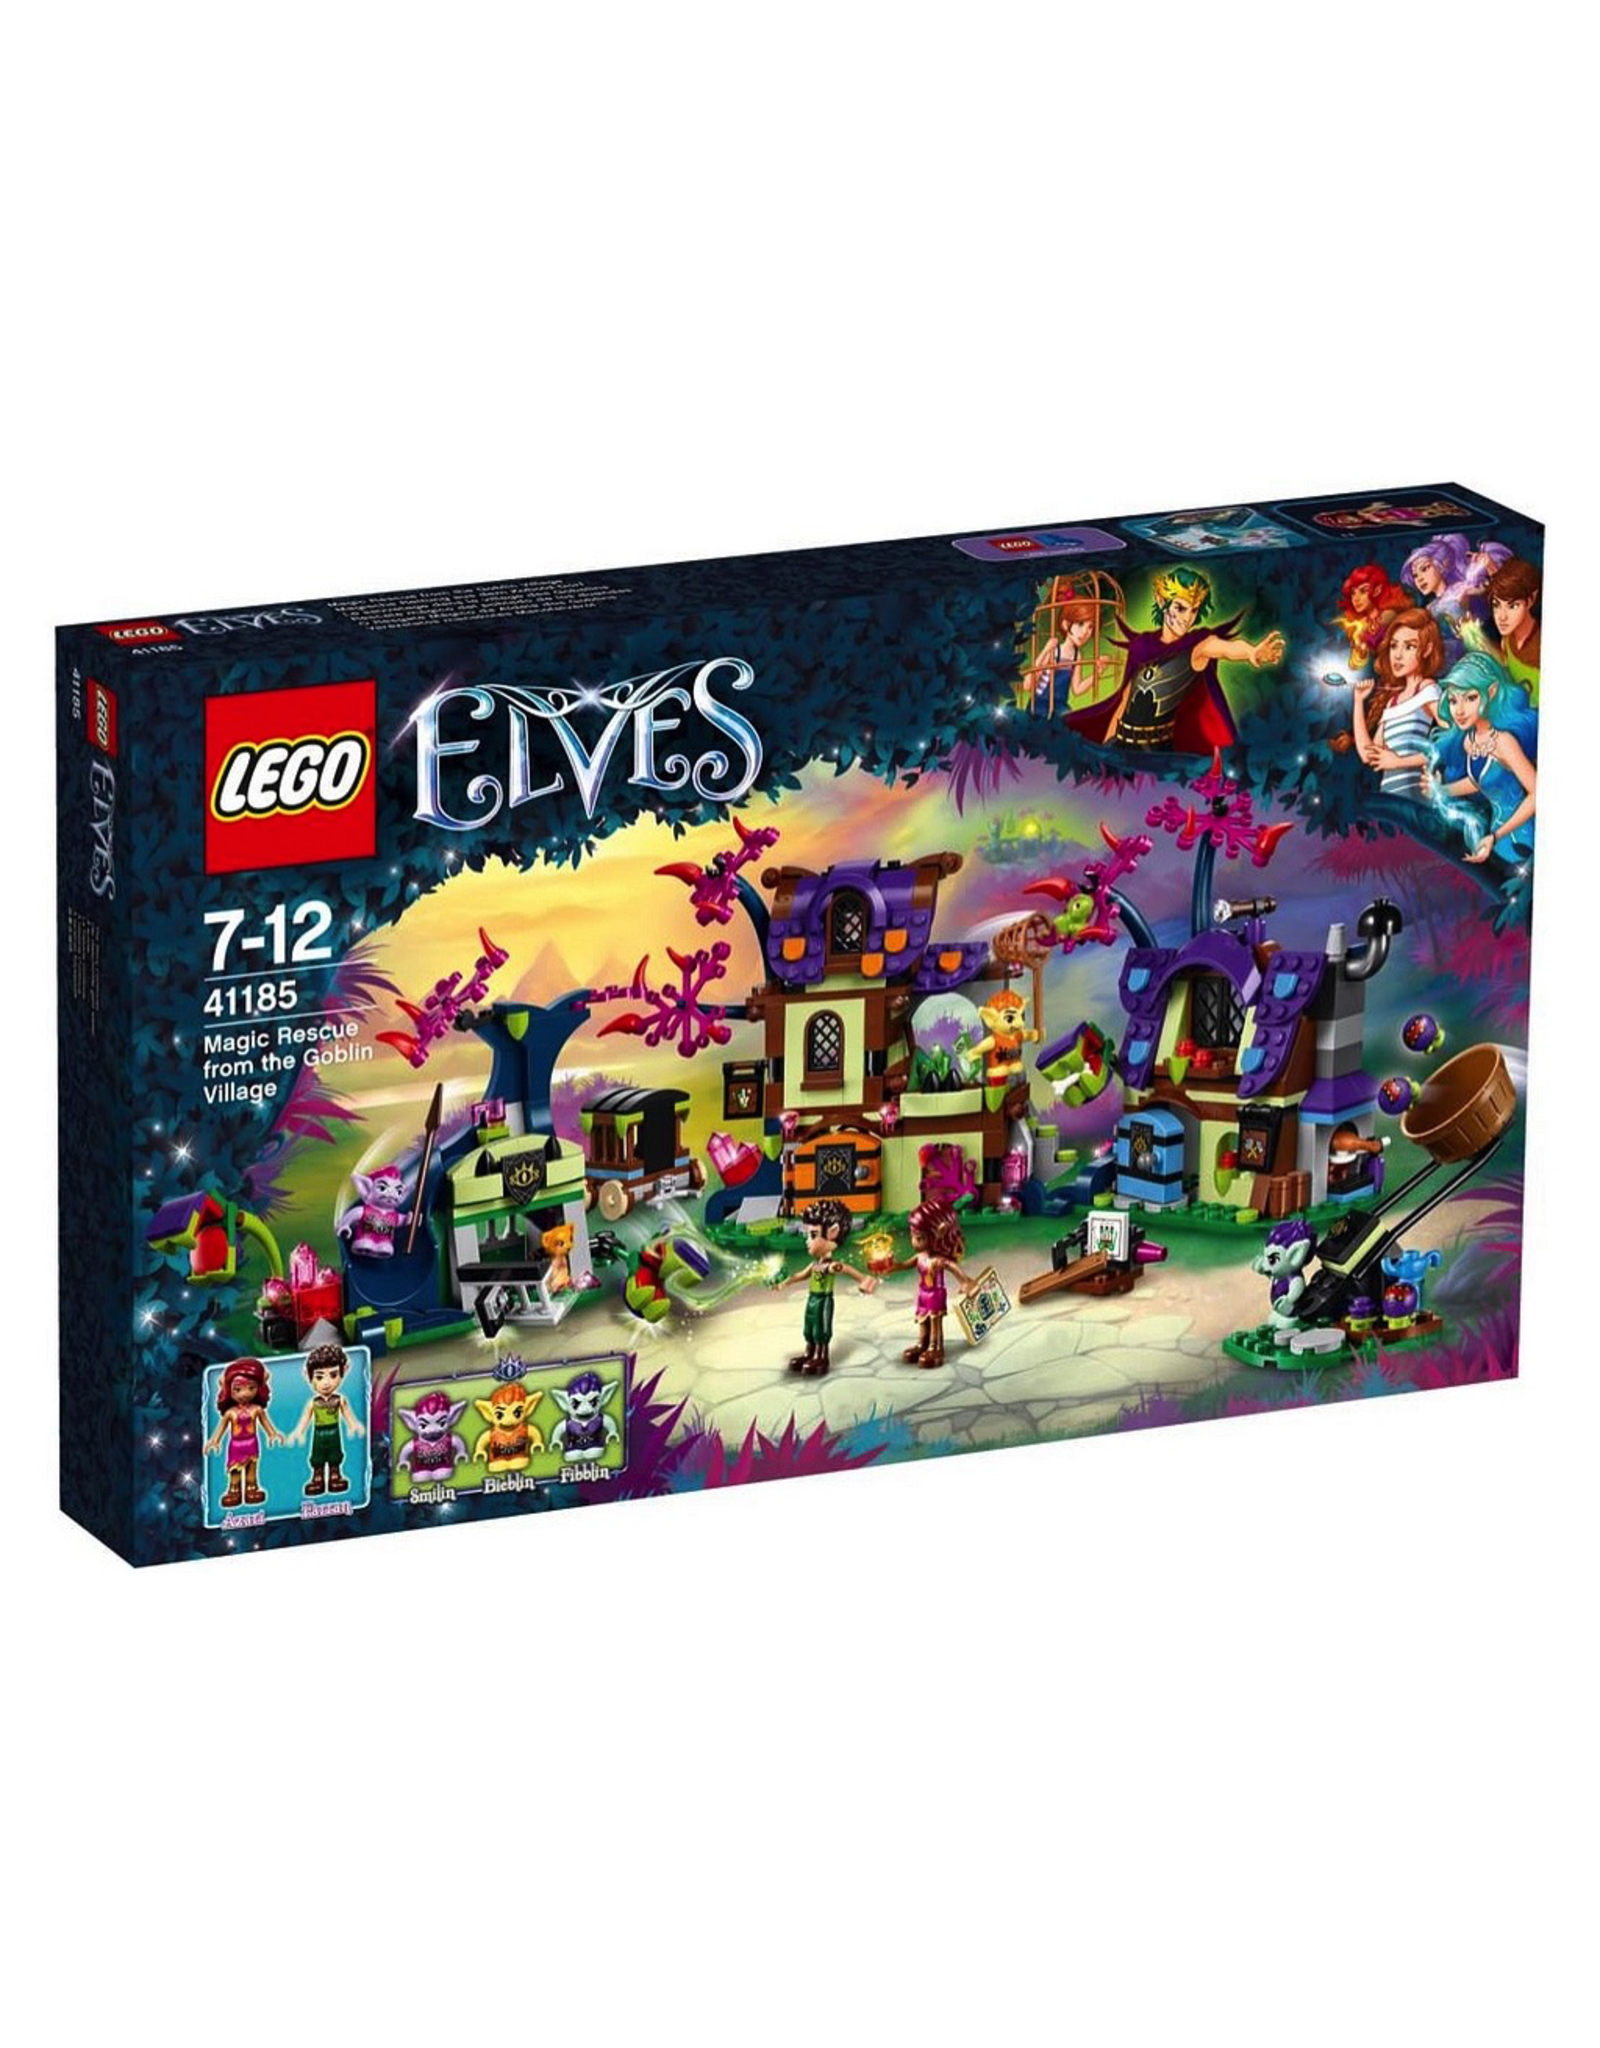 LEGO ELVES - 41185 MAGIC RESCUE FROM THE GOBLIN VILLAGE